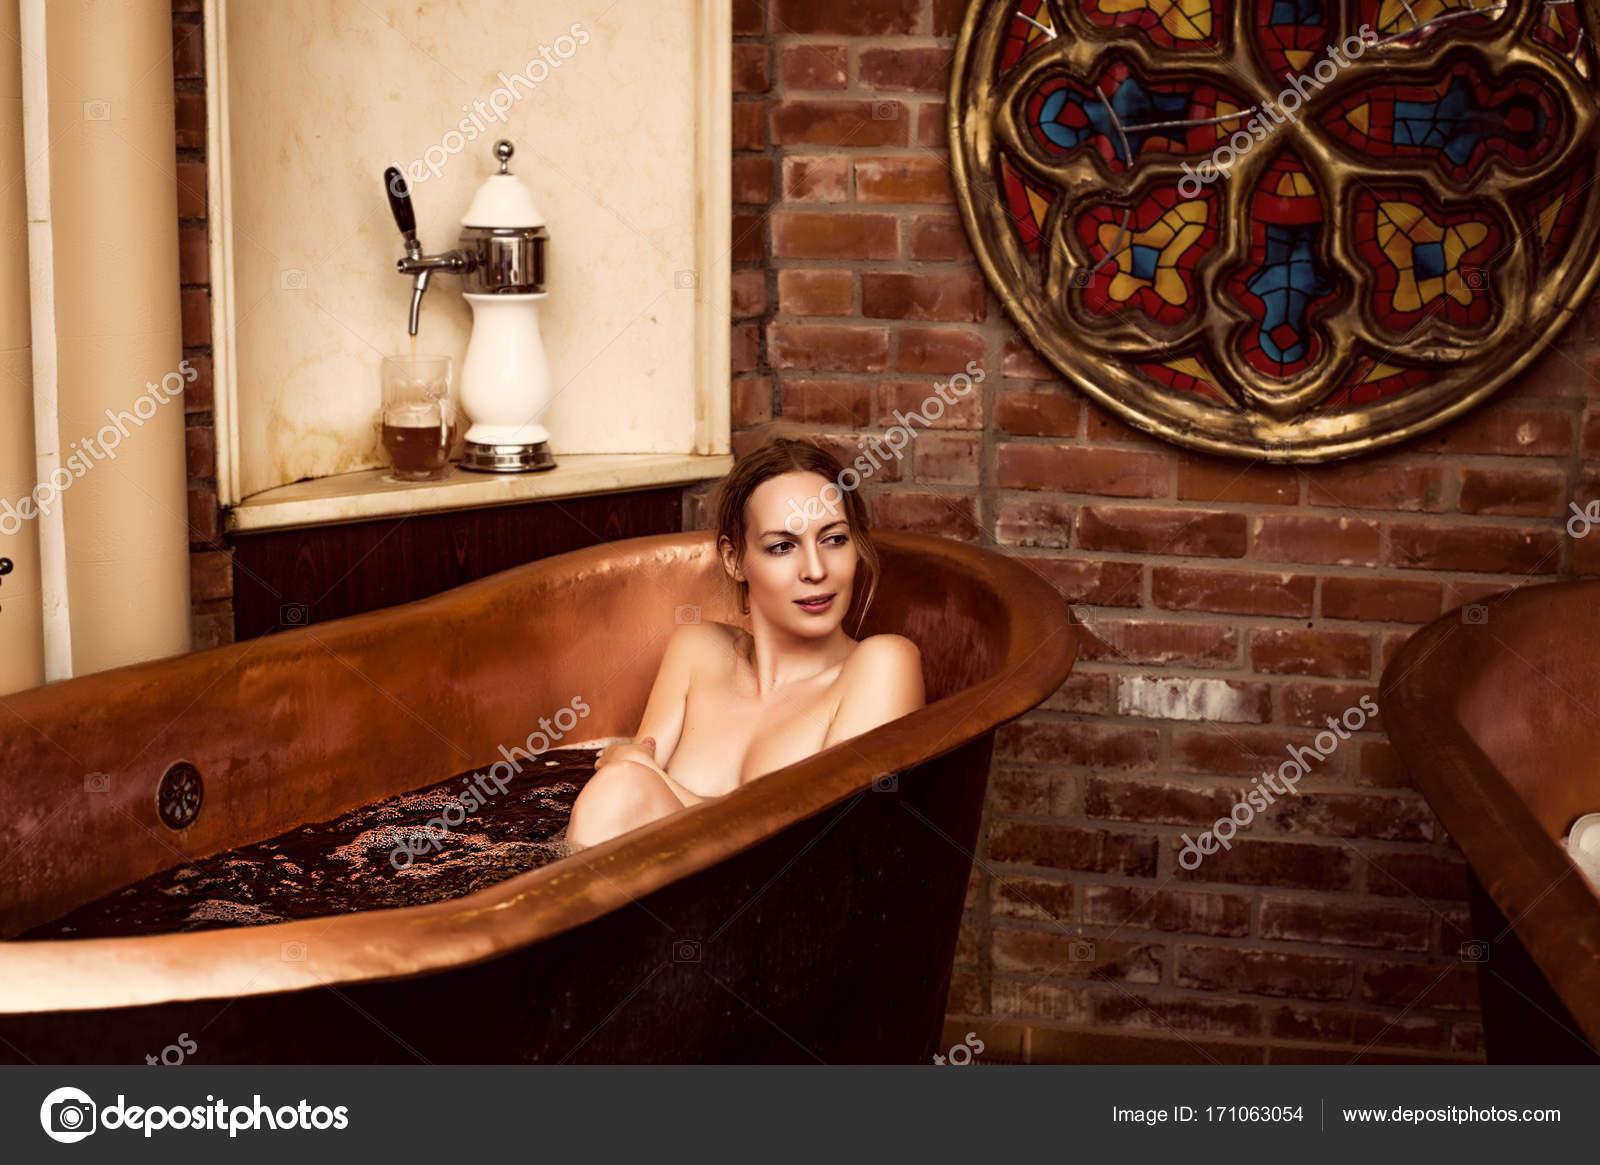 Vasca Da Bagno Di Rame : Spedizione gratuita bagno di rame apertura rapida valvola tee